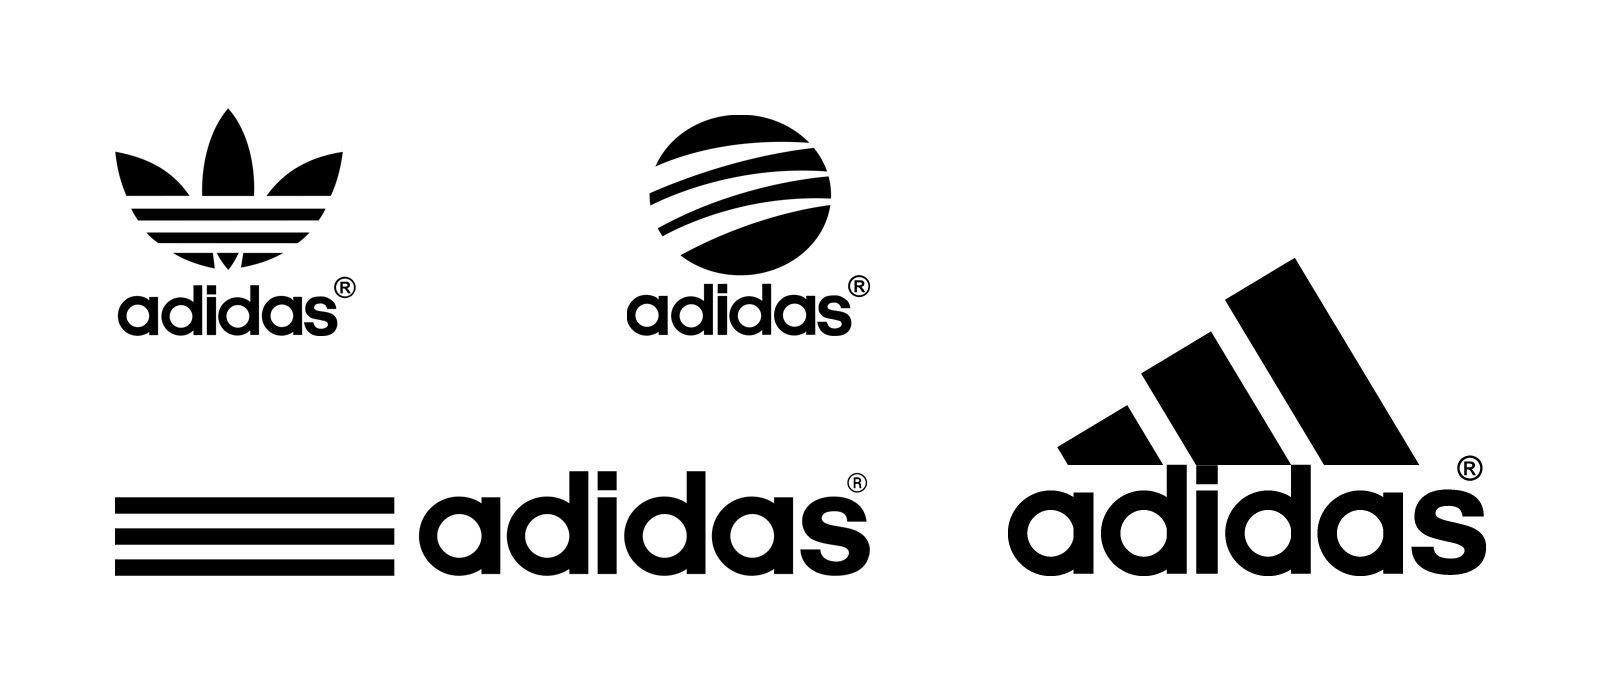 Pin By Justin Otstott On Sports Adidas Brand Adidas Branding Design